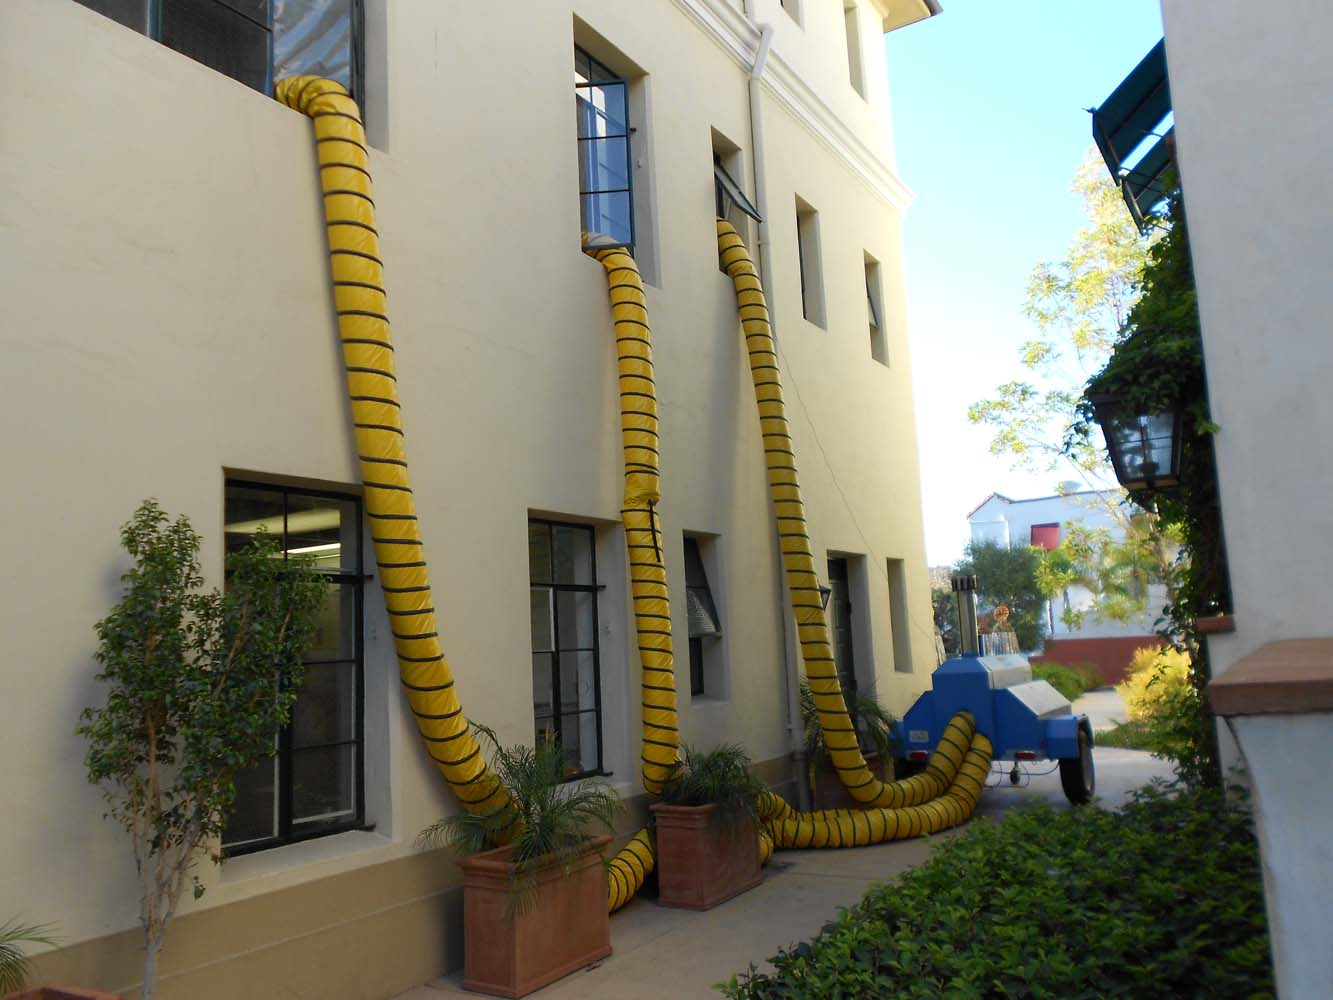 Commercial Damage Restoration for Santa Barbara and Ventura